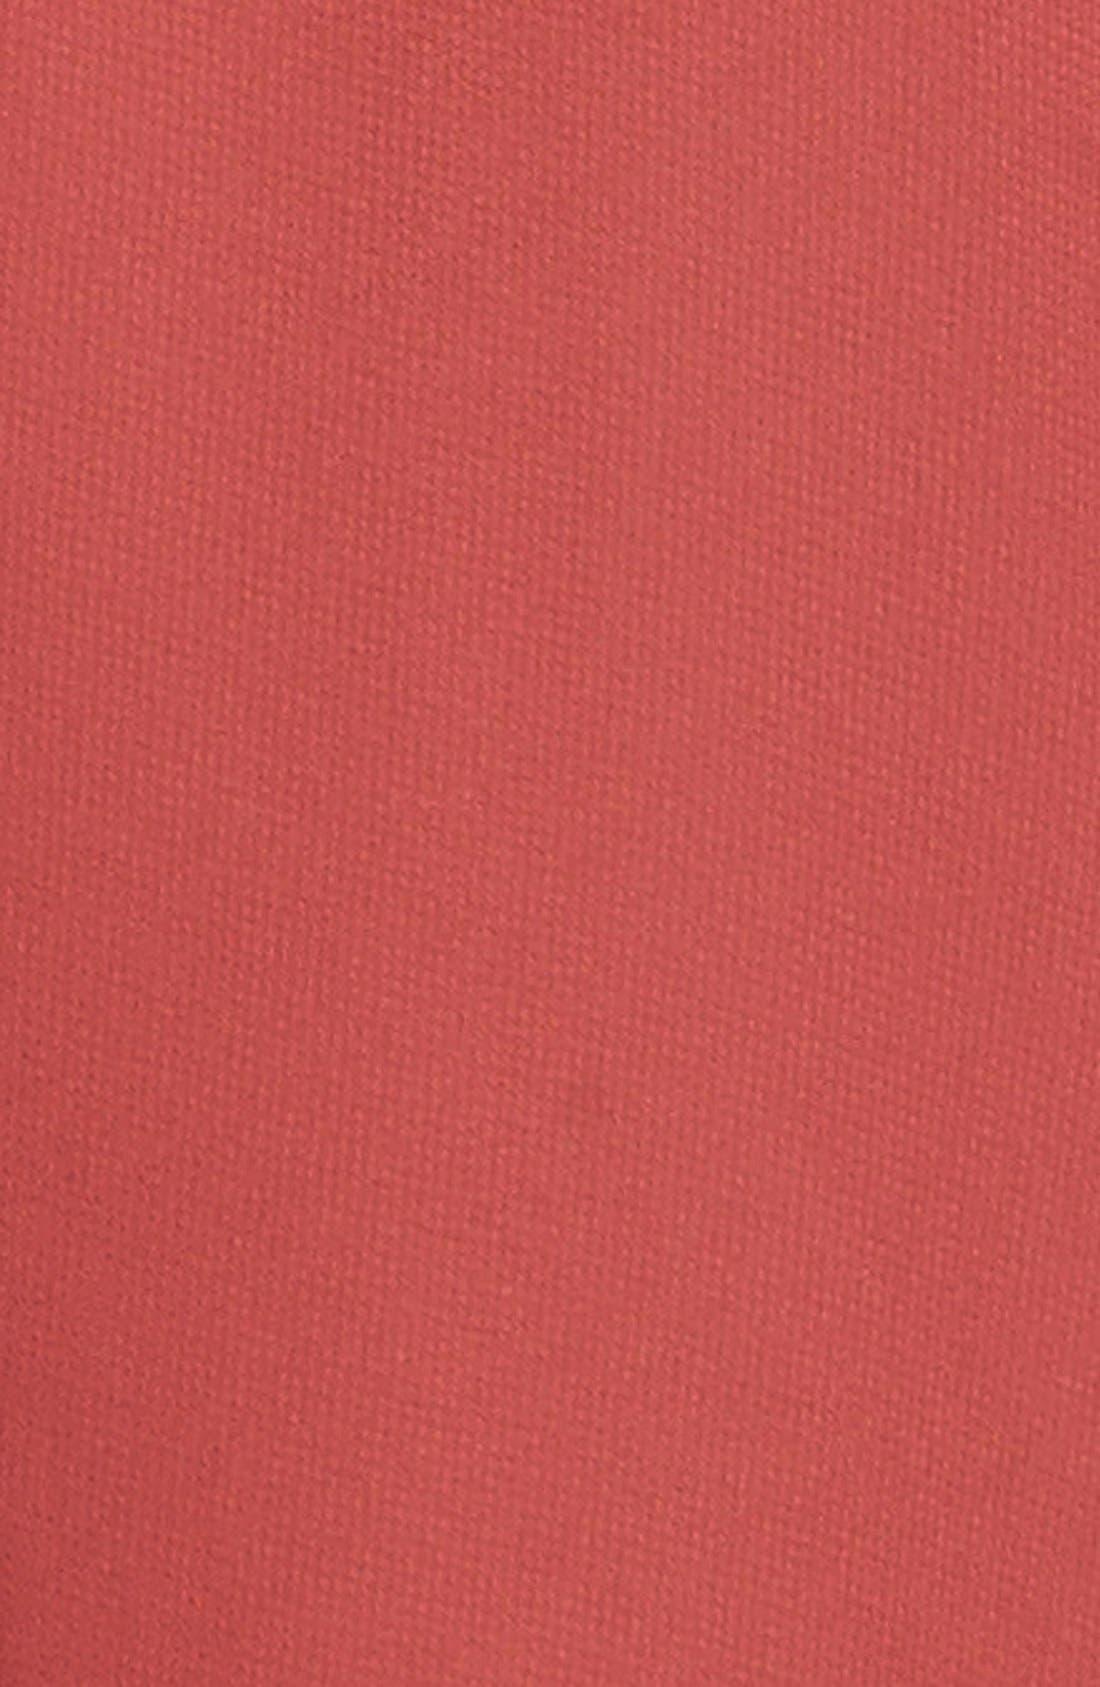 Blouson Chiffon Skater Dress,                             Alternate thumbnail 147, color,